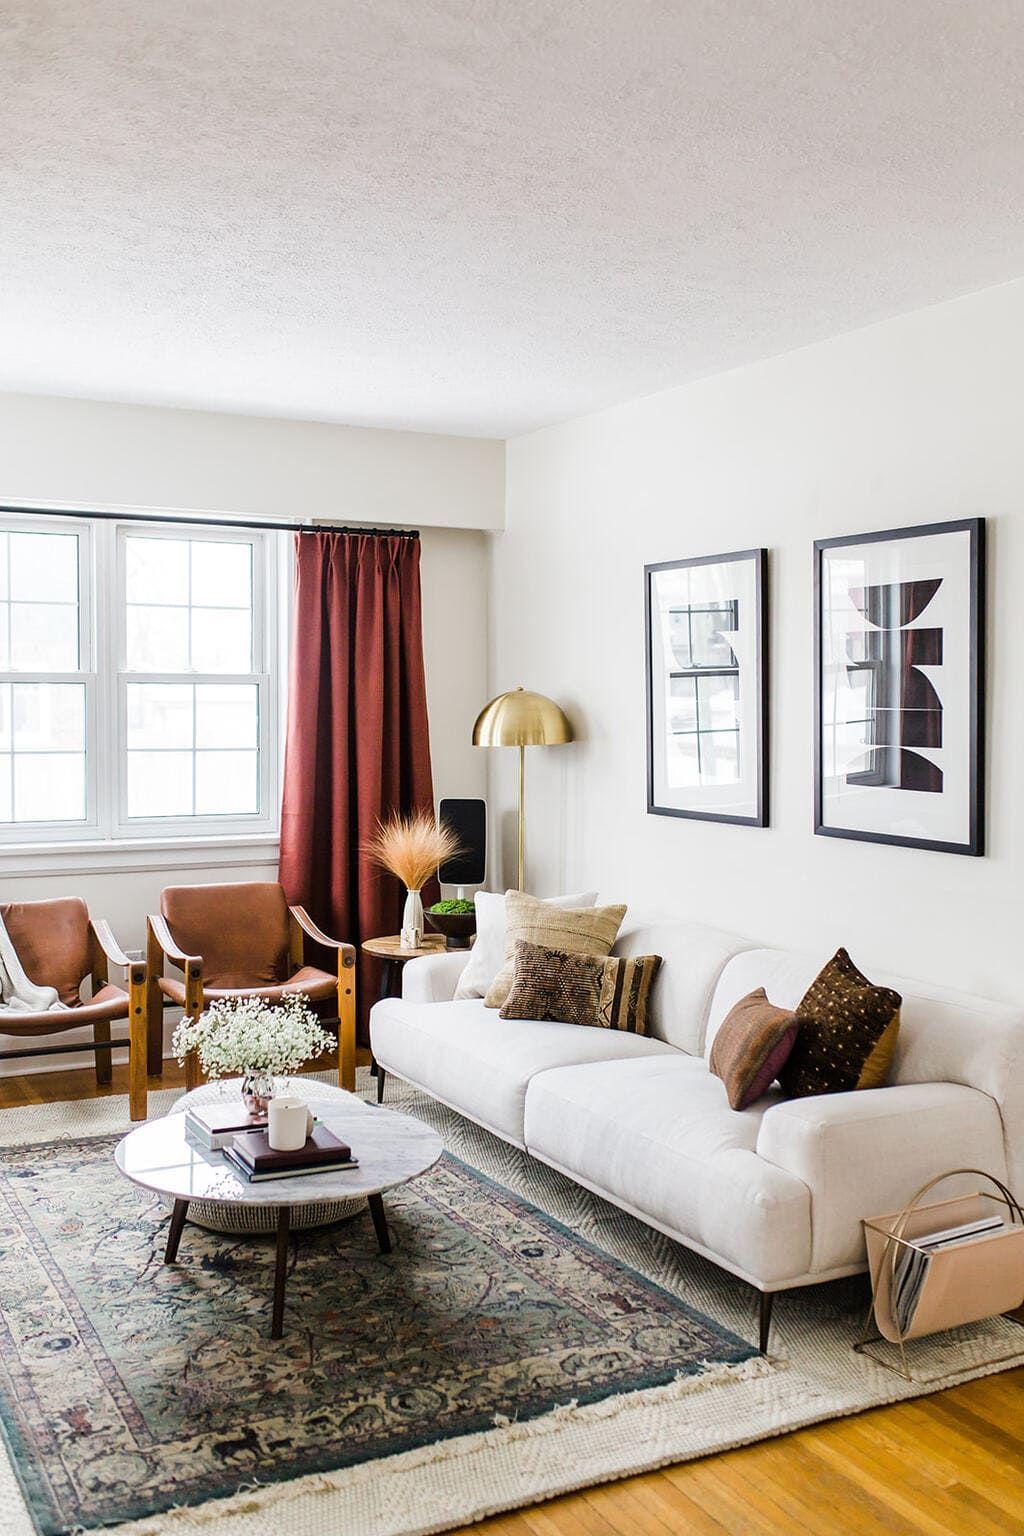 Home Decorating Trends 2020 24 Popular Interior Decor Ideas Living Room Decor Neutral Neutral Living Room Trending Decor